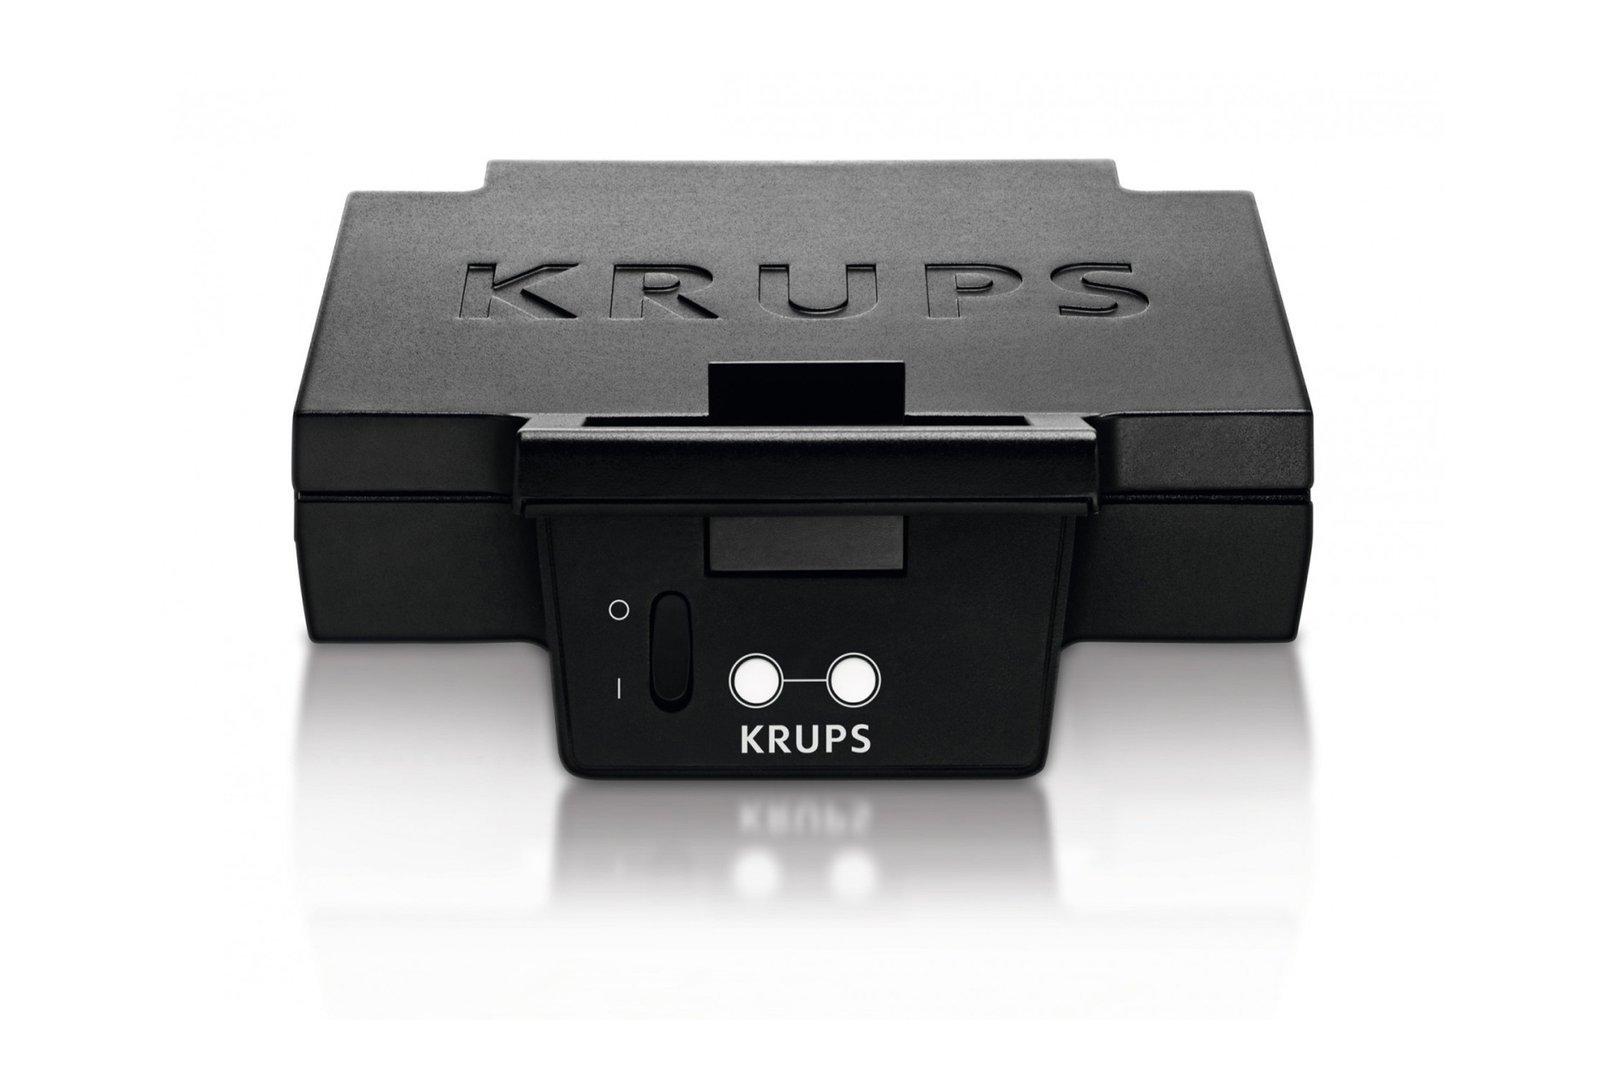 Krups Sandwichmaker FDK452 Black